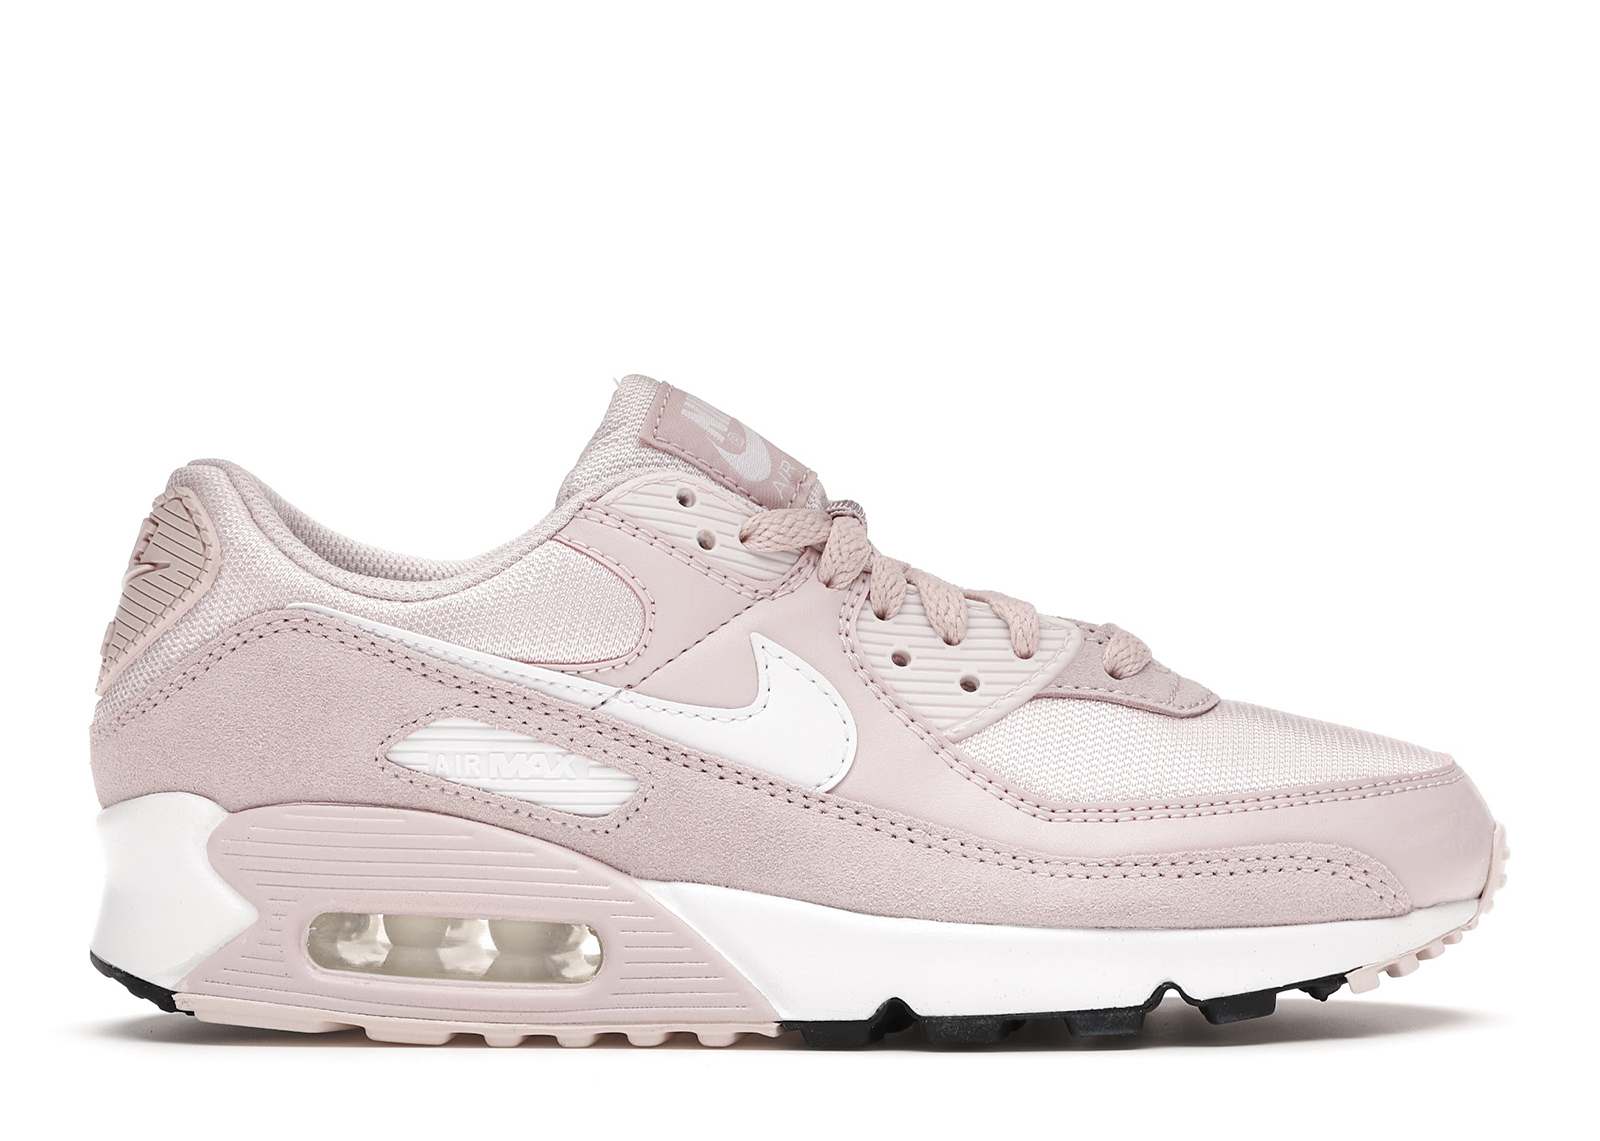 Nike Air Max 90 Barely Rose (W)